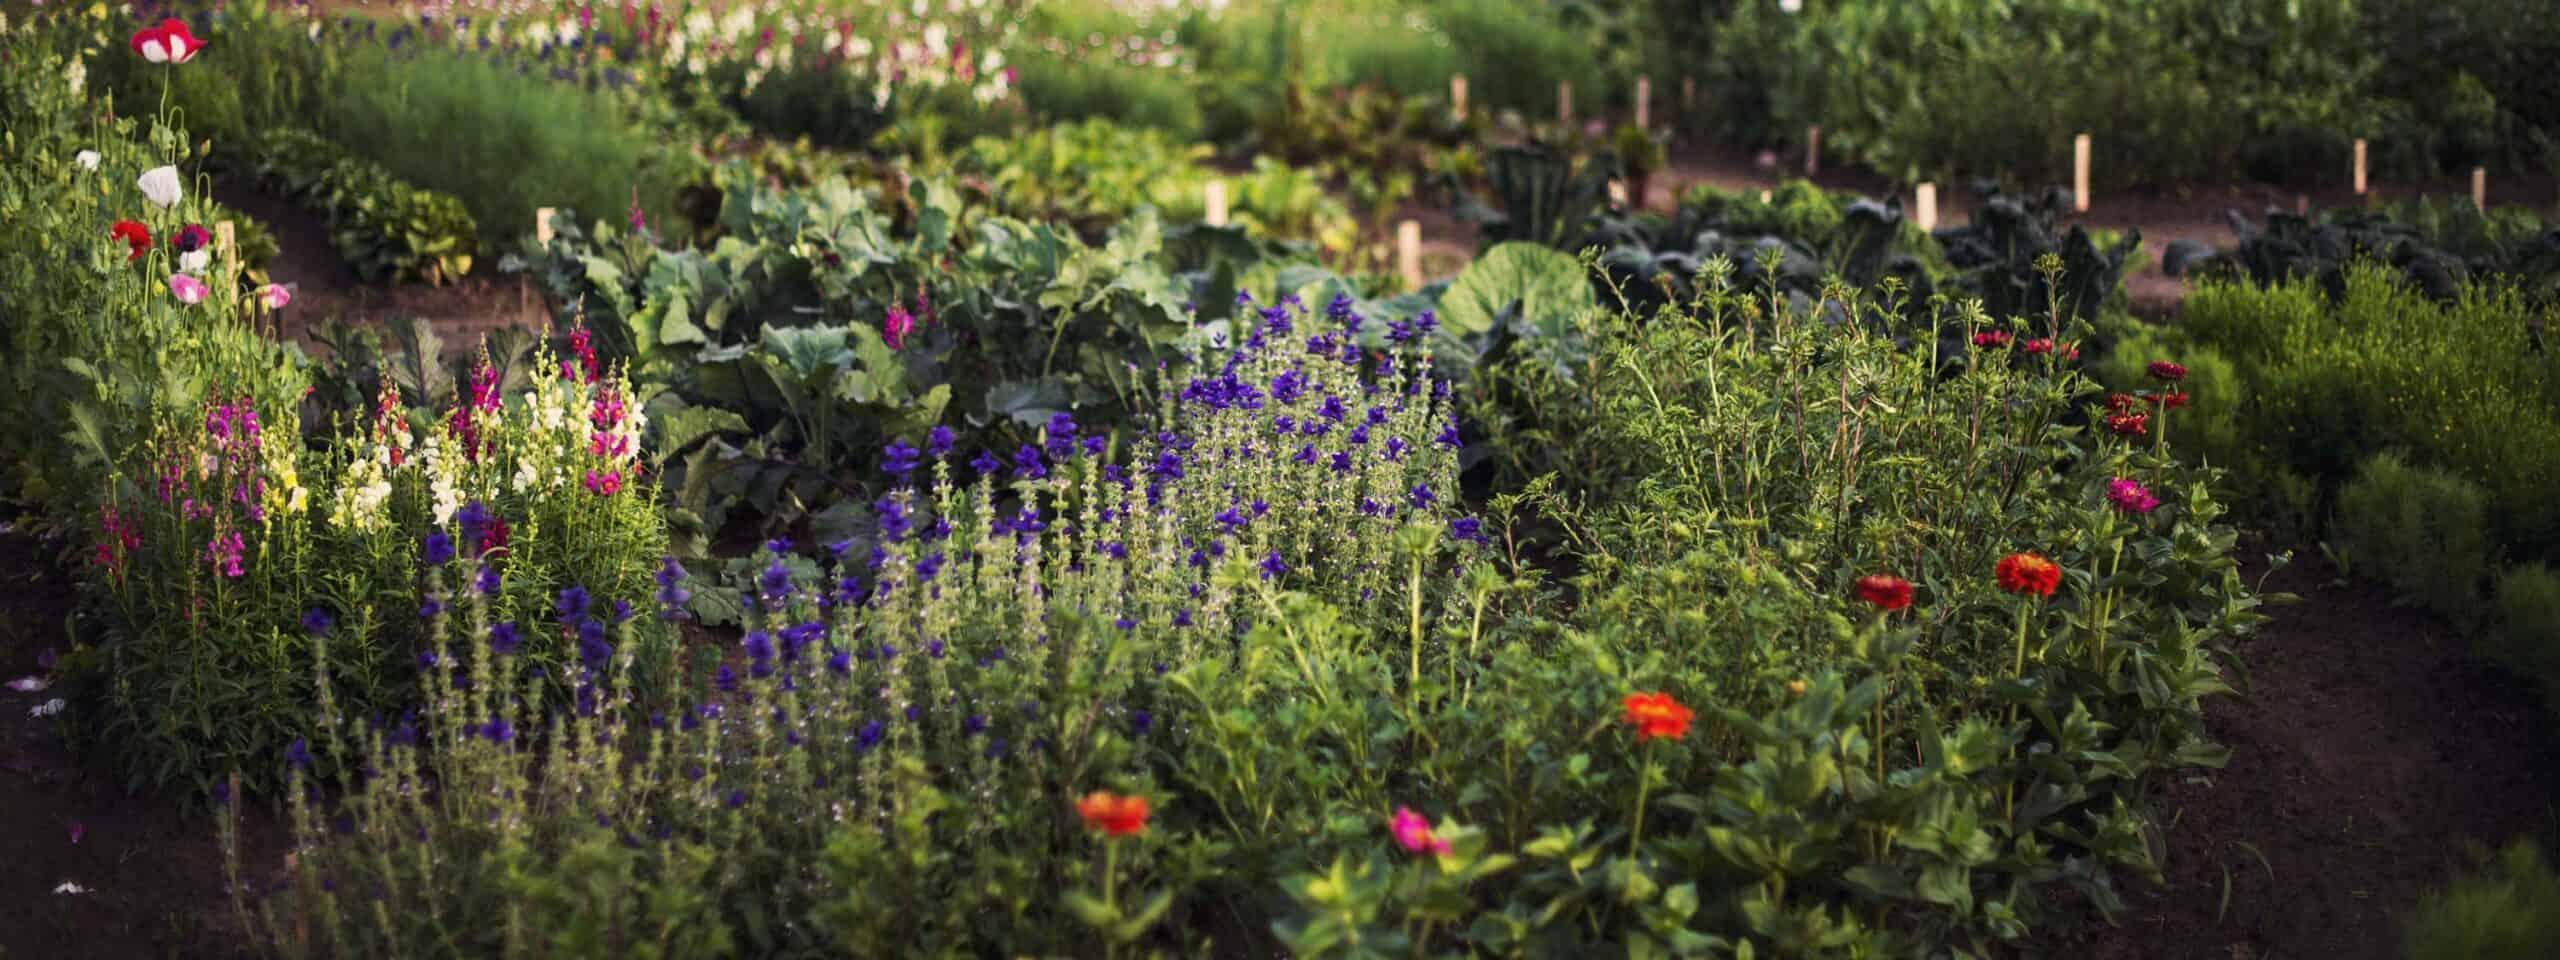 Trädgårdsresan - Nulägesanalys